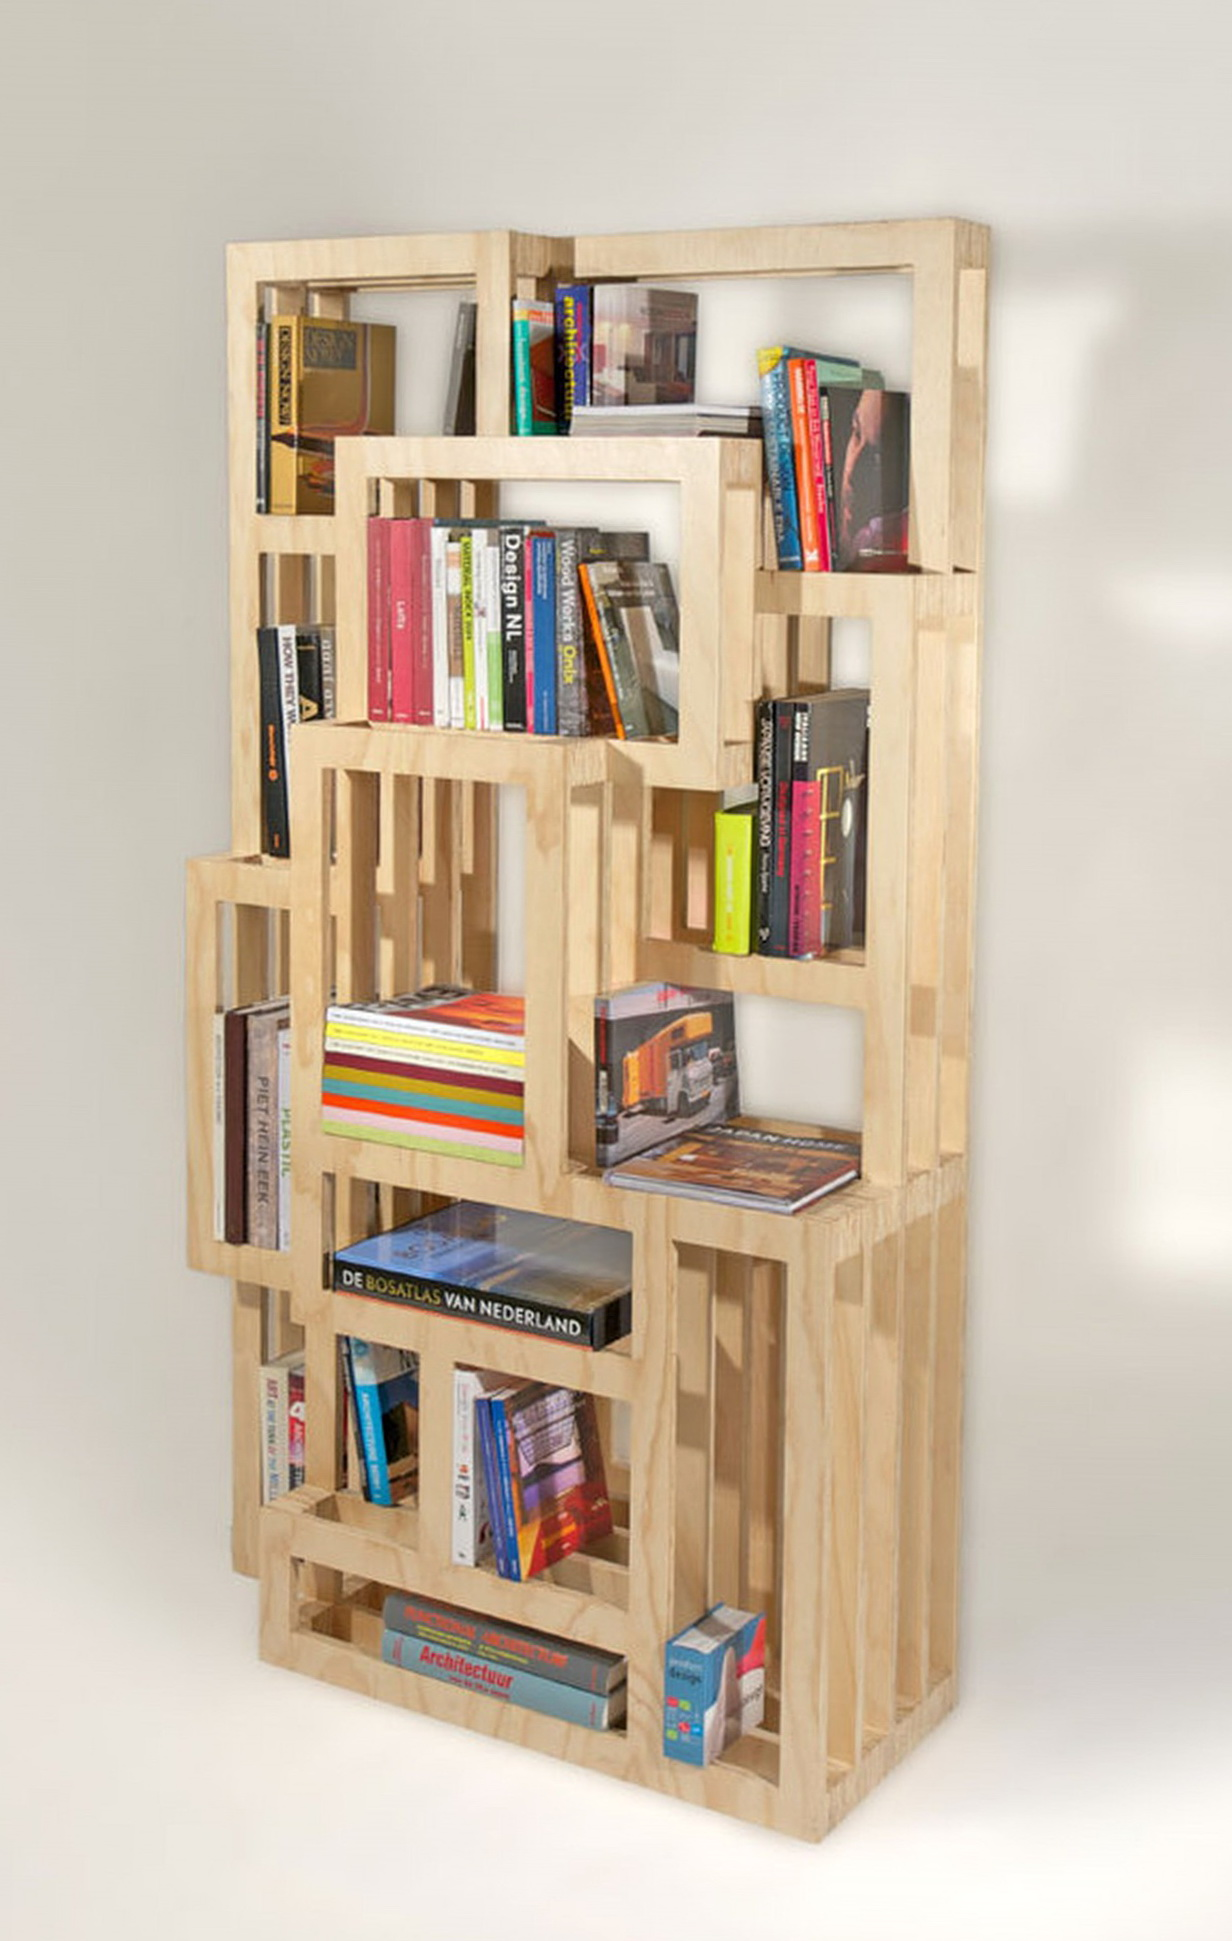 Permalink to Homemade Bookshelf For Kids